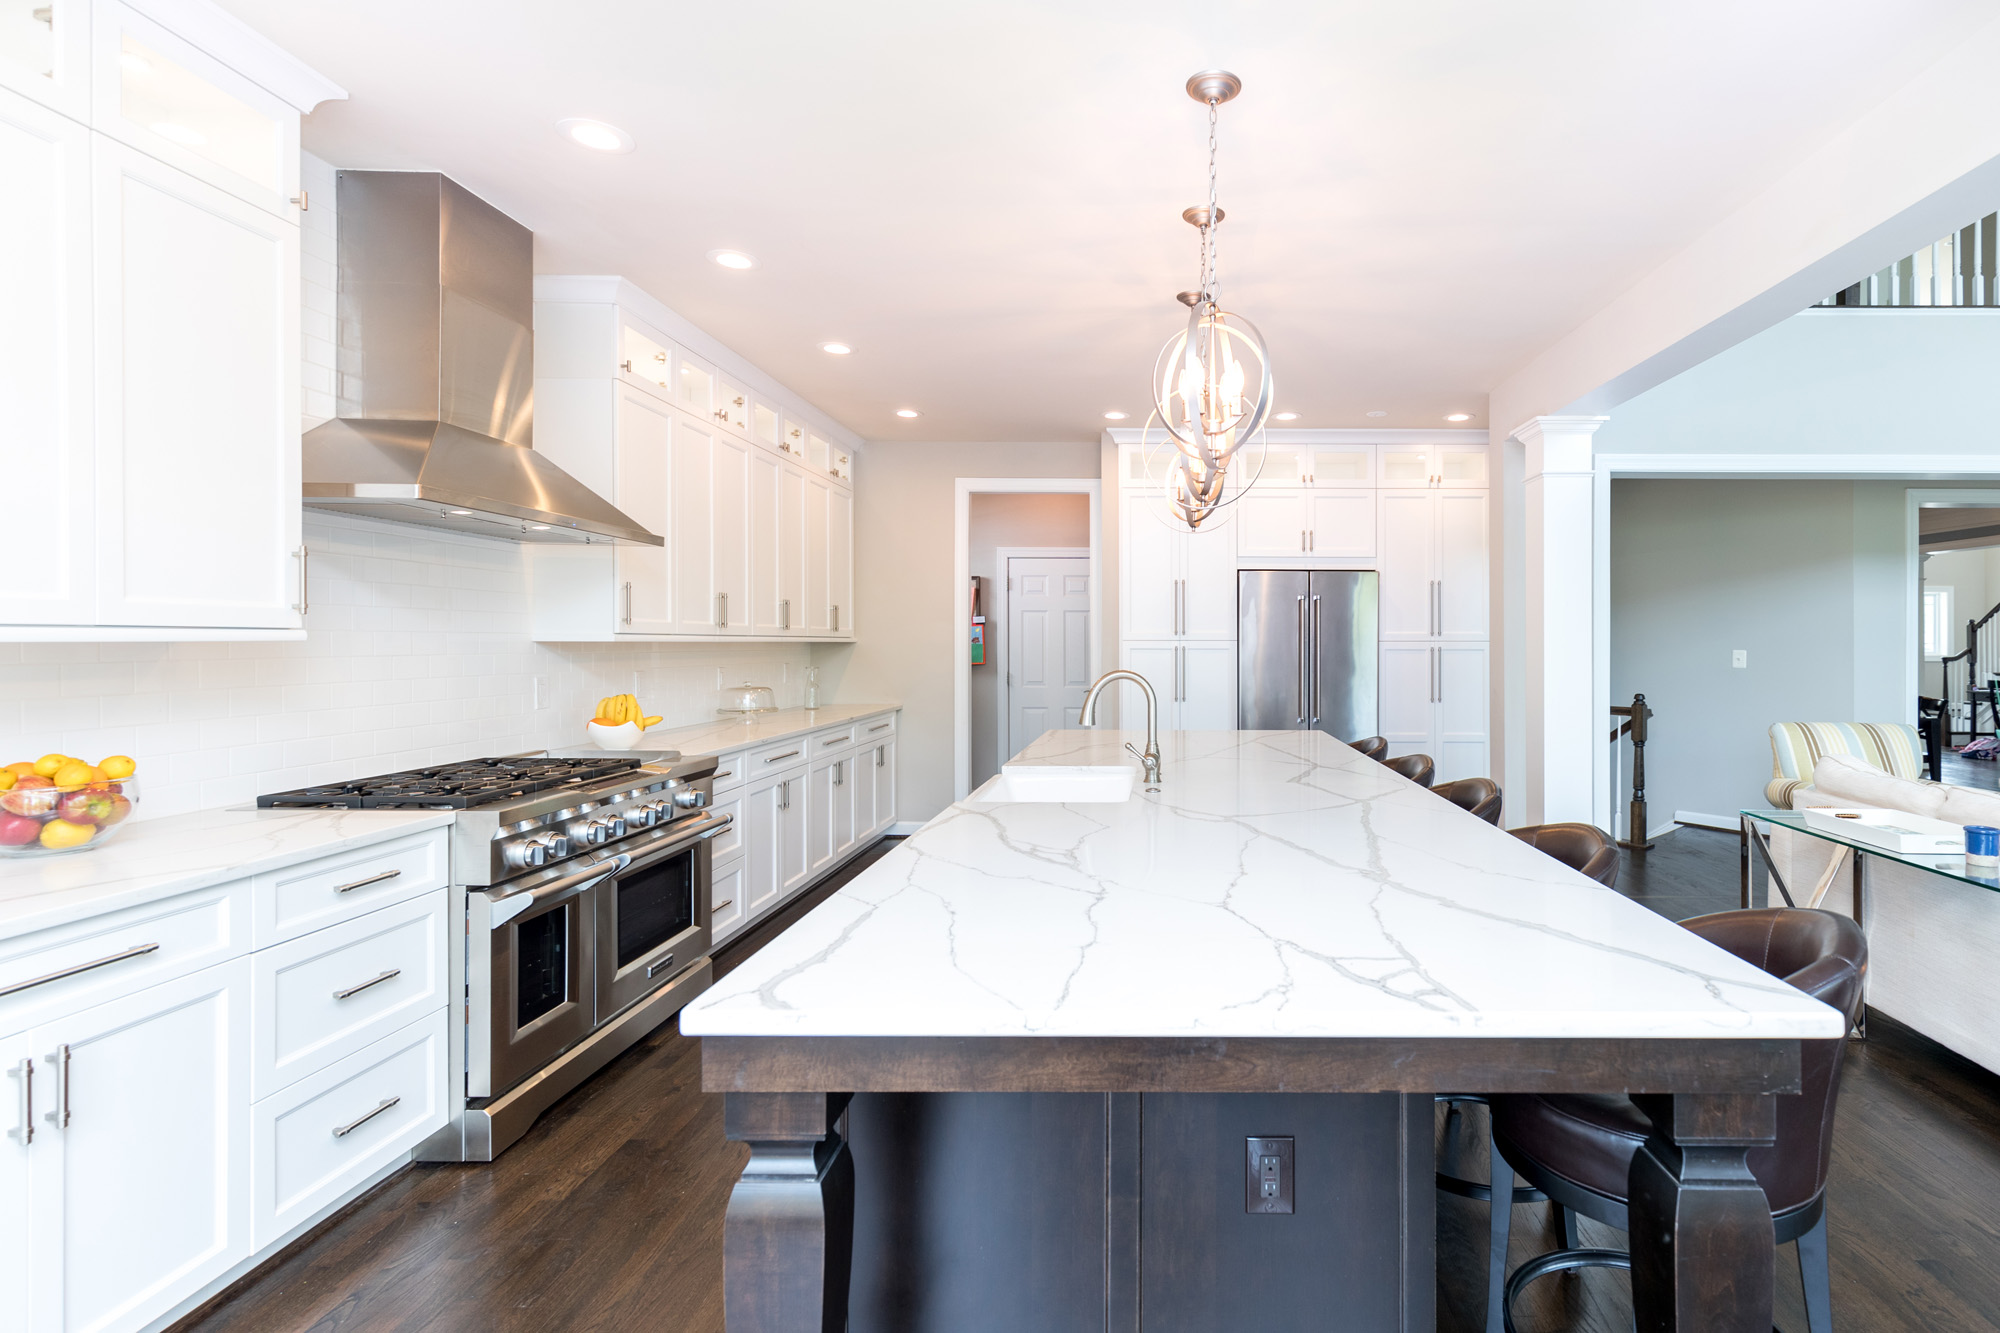 Kitchen Remodeling in Ashburn, VA - Kitchen & Bath Remodeling ...